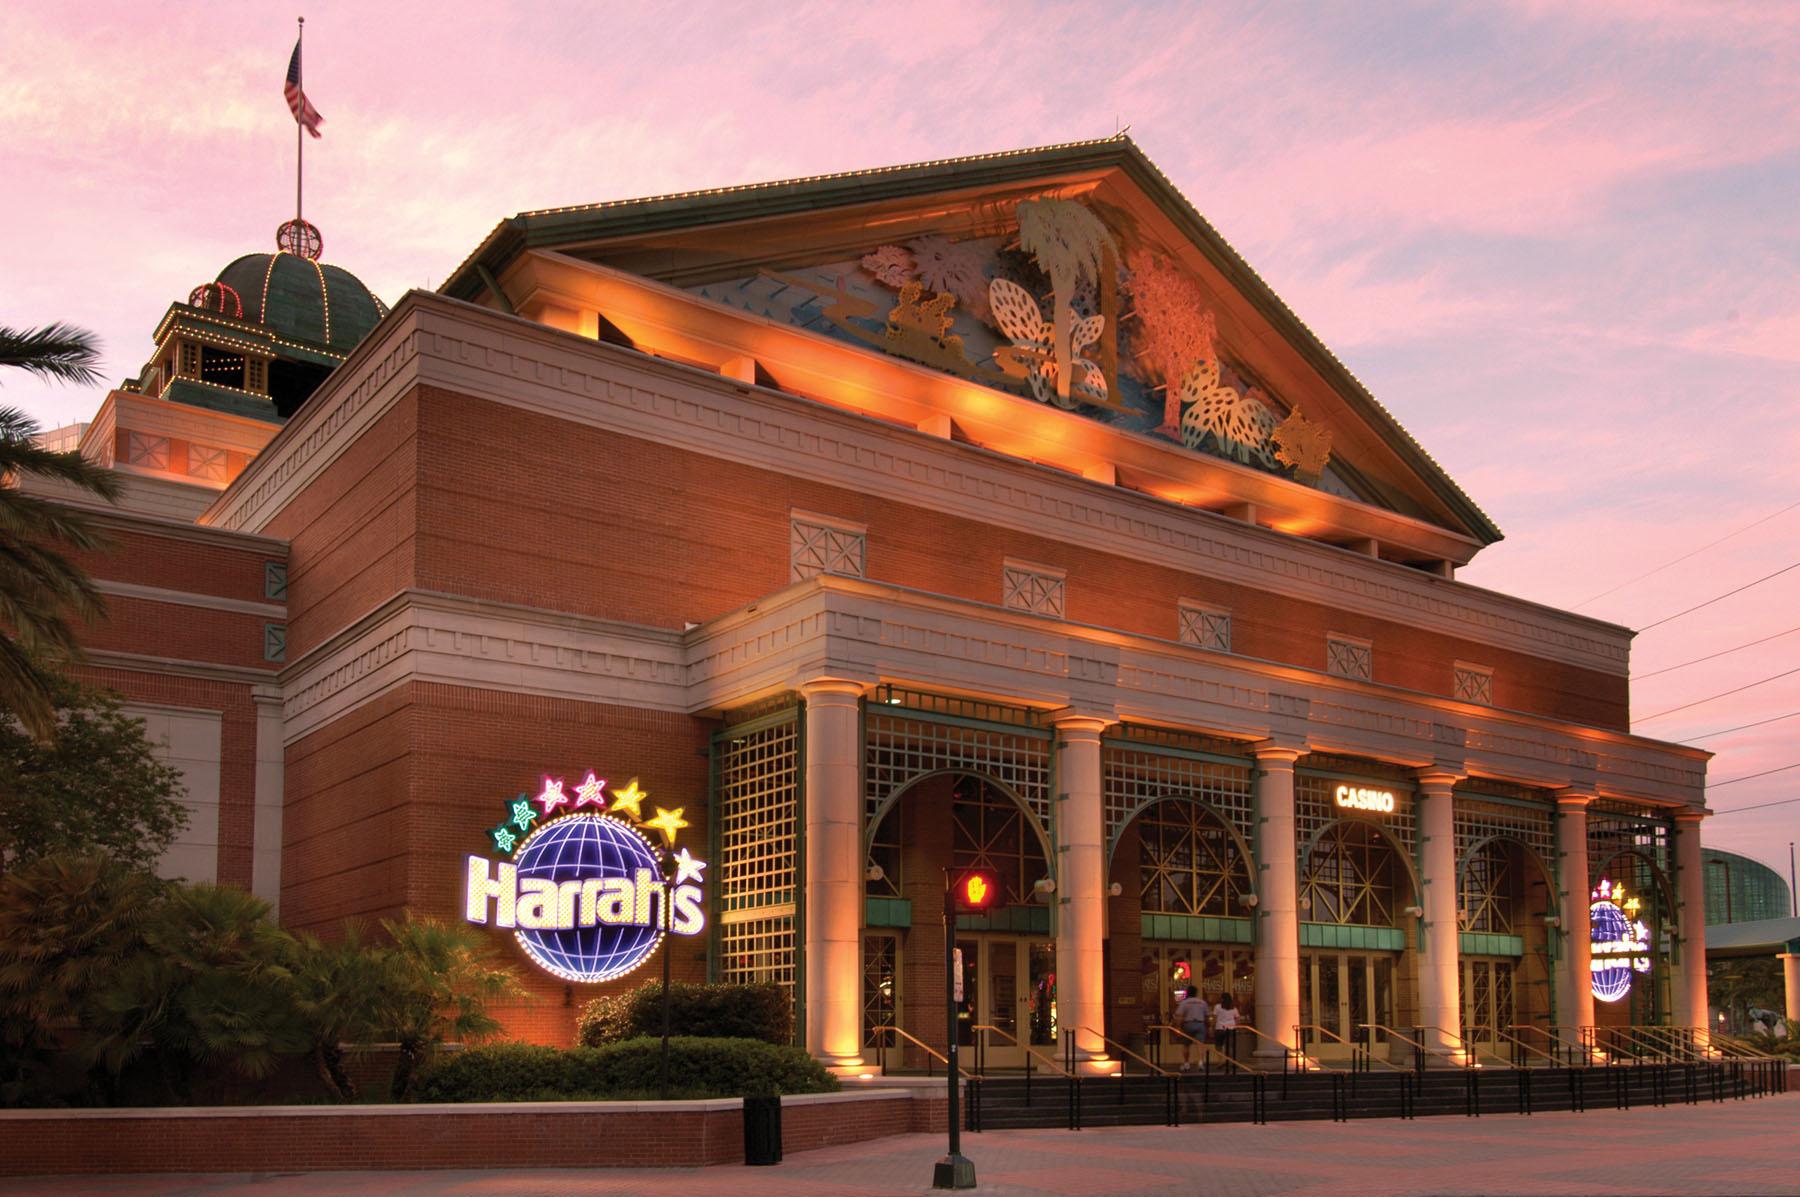 Harrahs Casino New Orleans Hotel